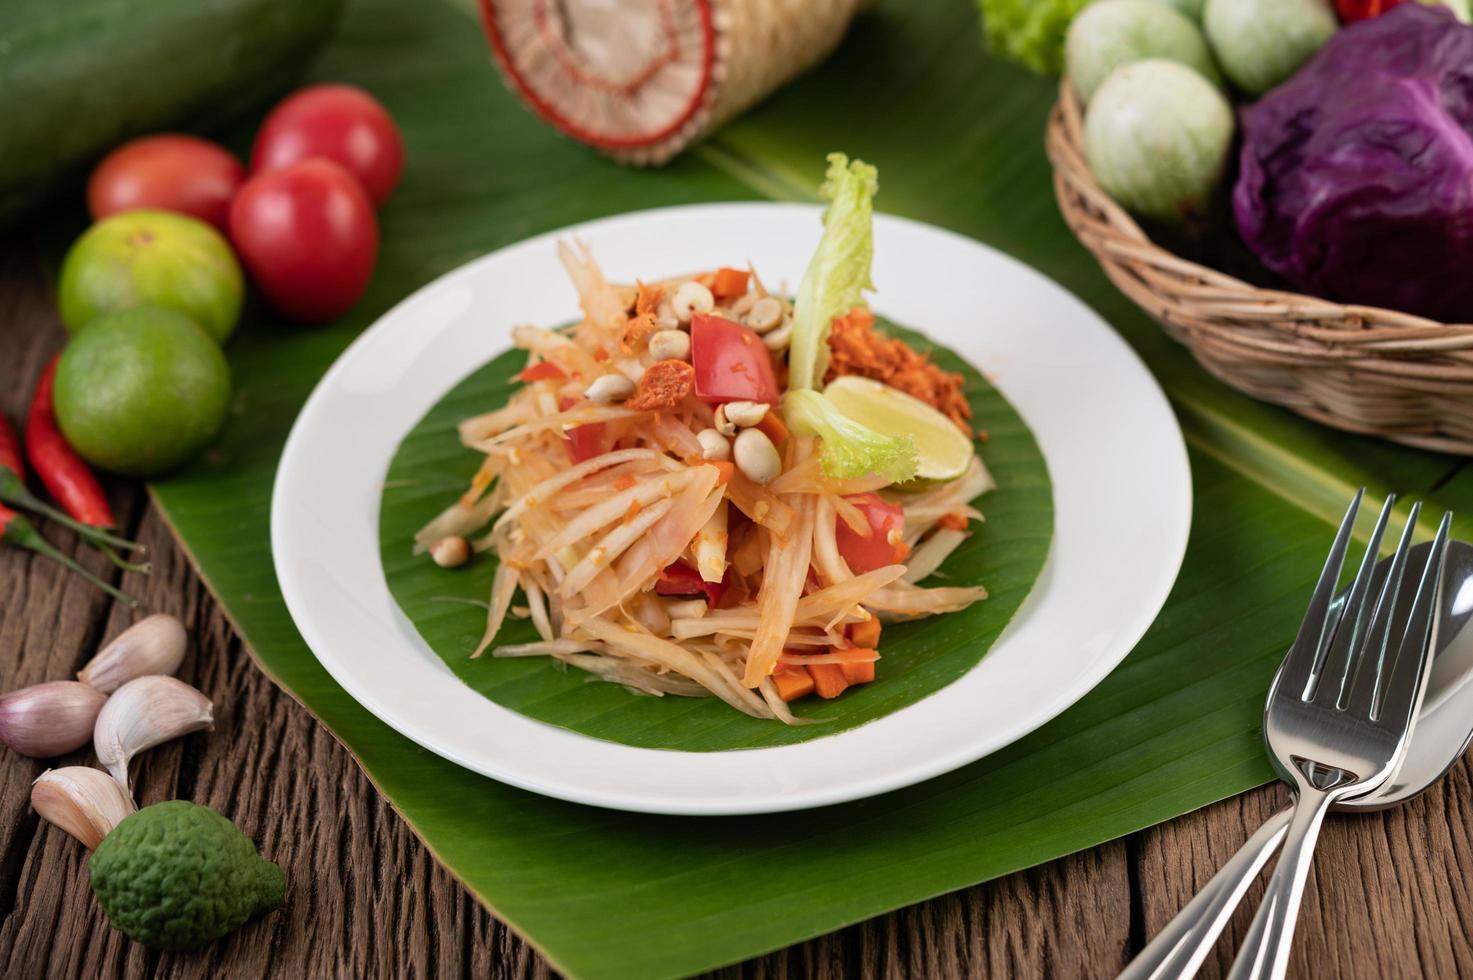 Thai papaya salad with banana leaves and fresh ingredients photo